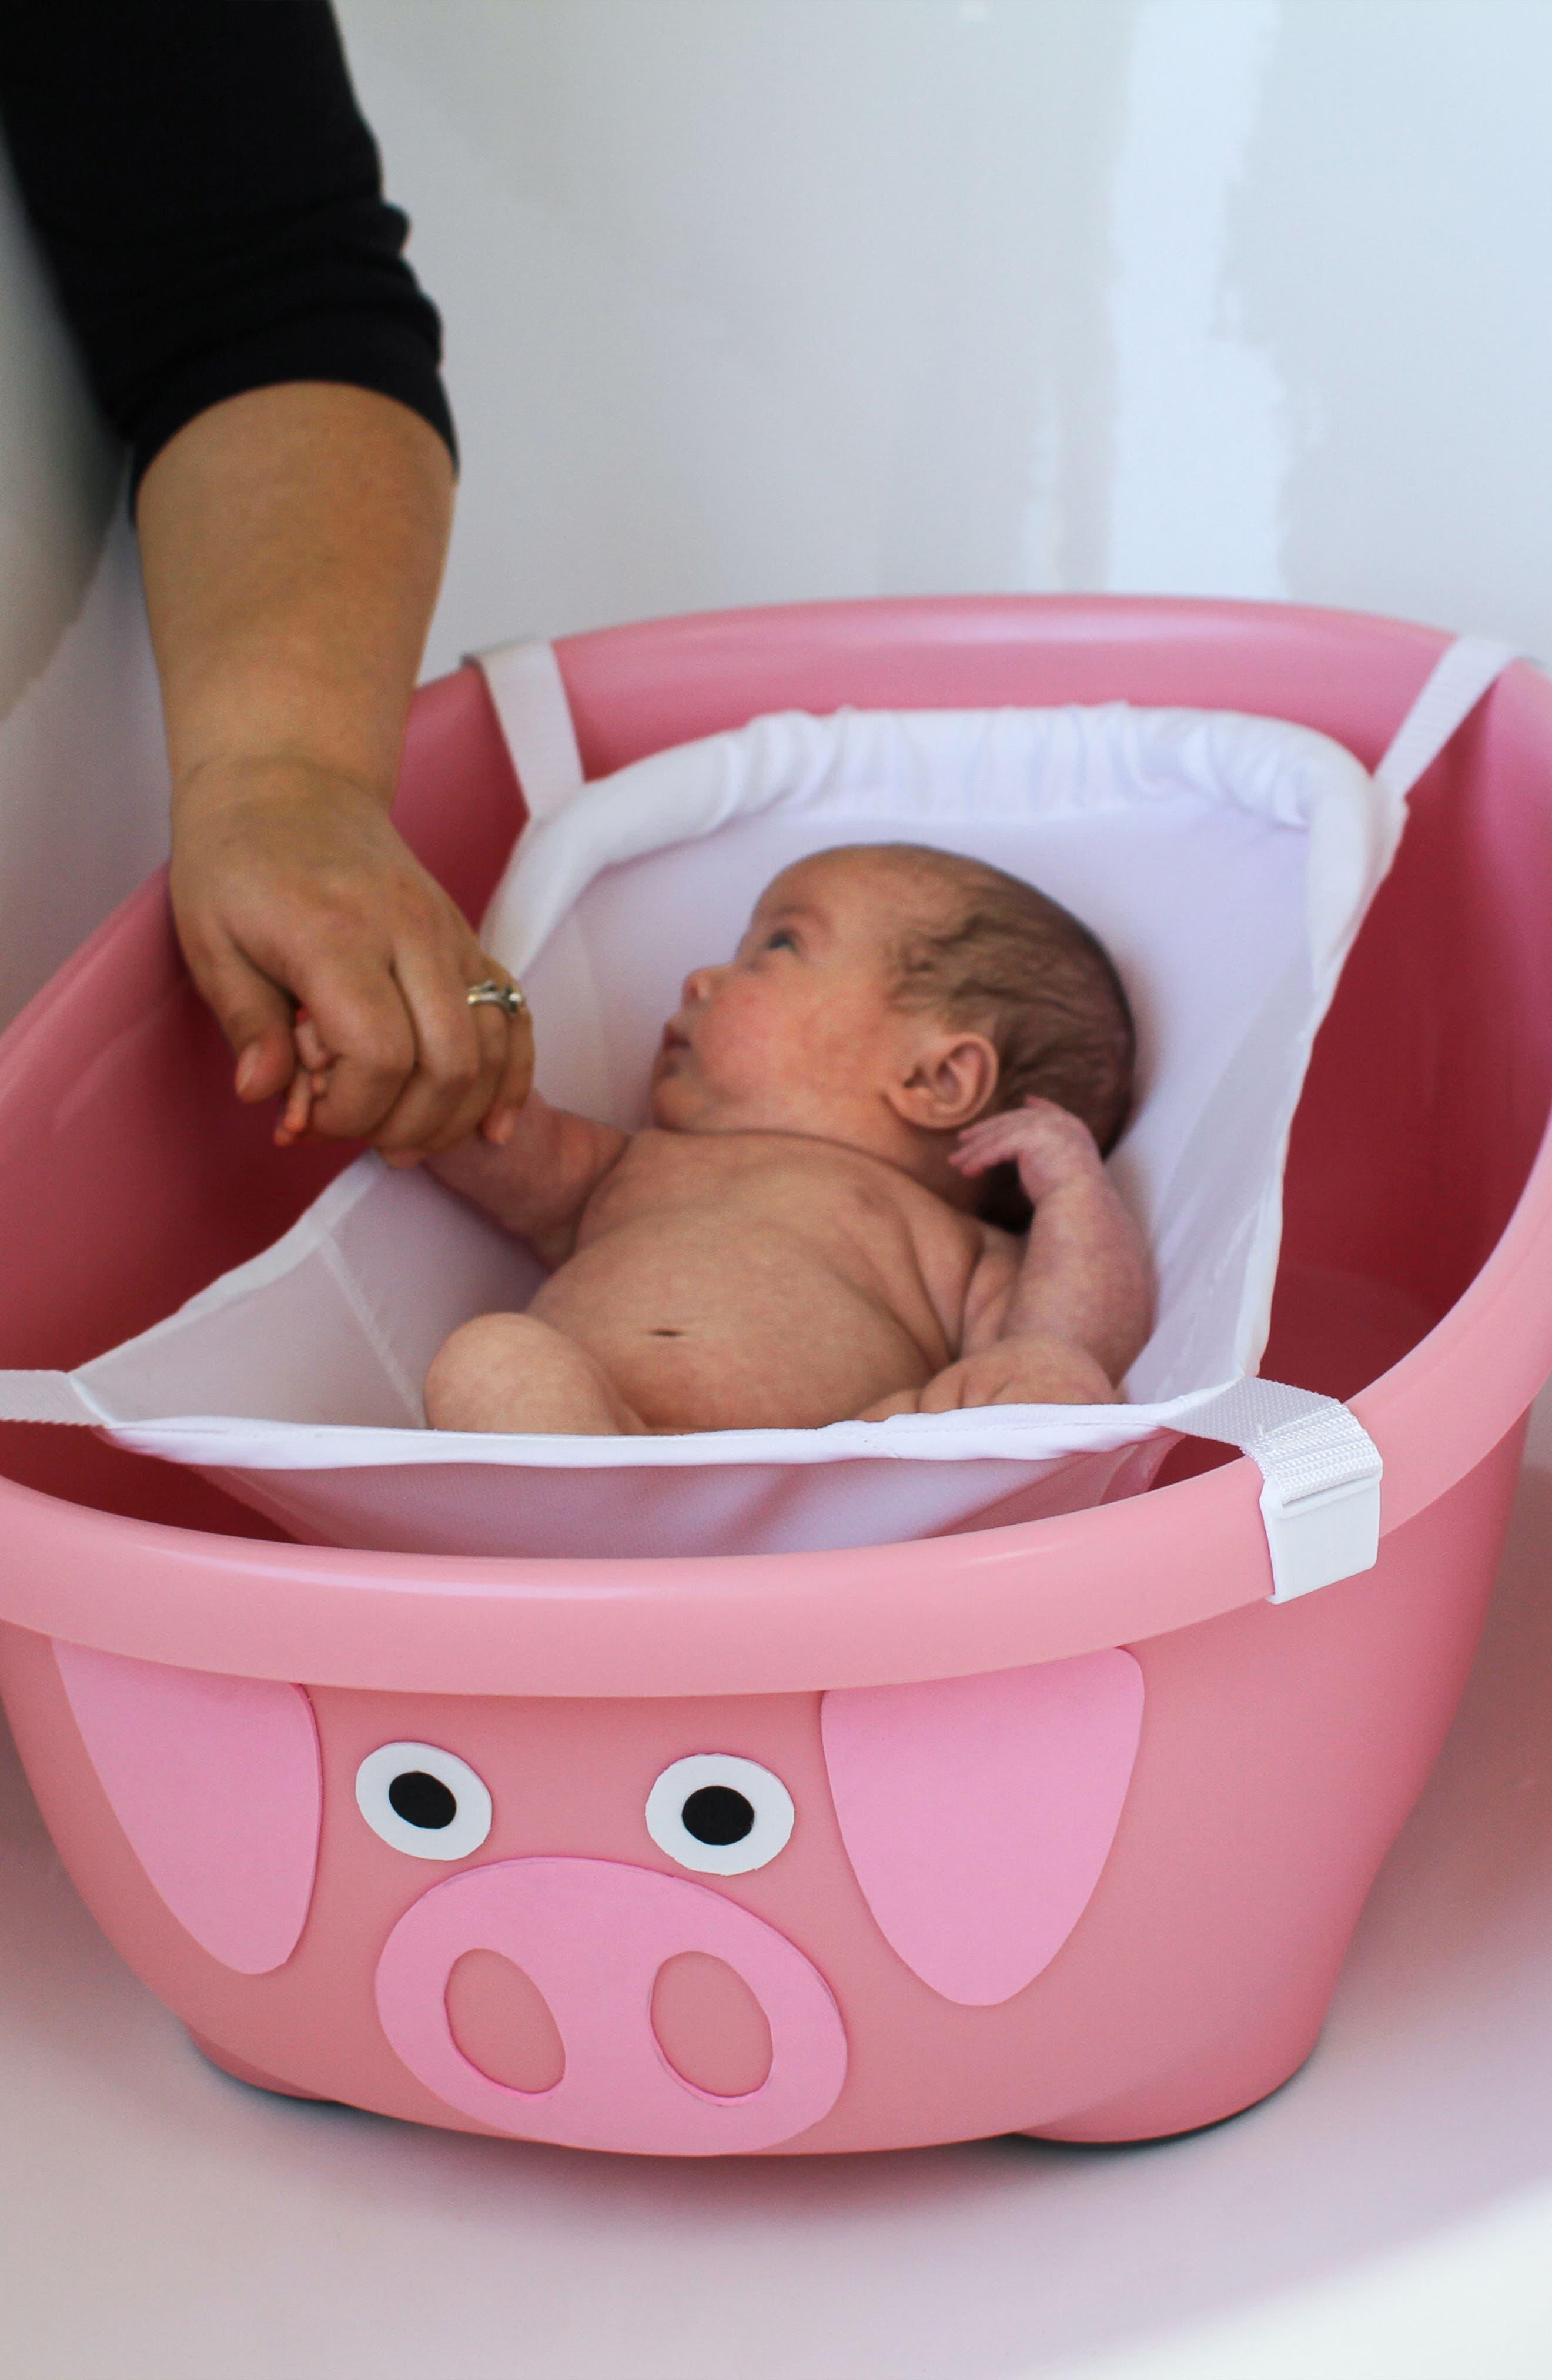 Tubimal<sup>™</sup> Infant & Toddler Convertible Pig Tub,                             Alternate thumbnail 2, color,                             Pig